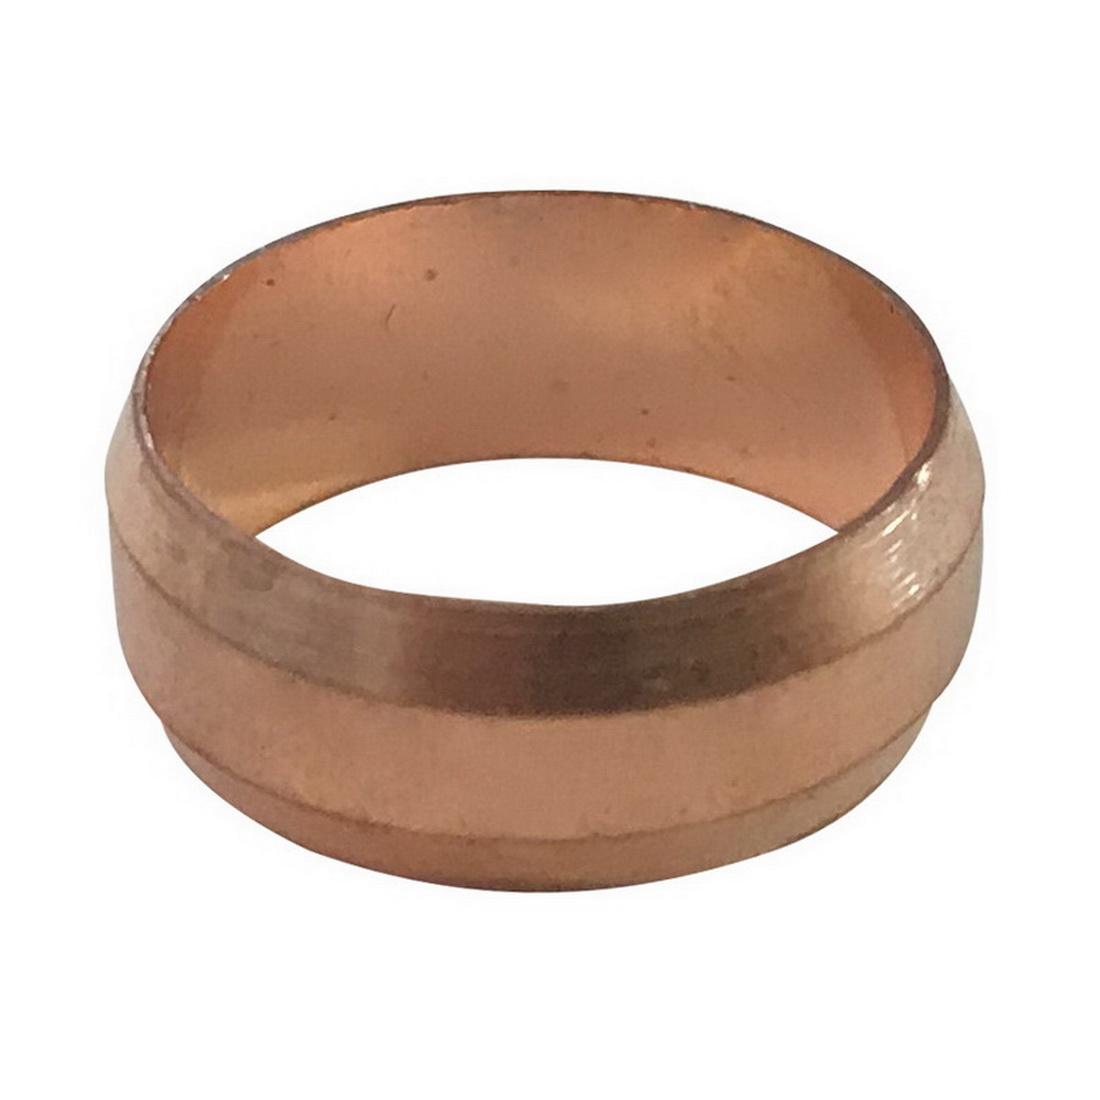 Copper Compression Gland 15mm  GLC15 10 Pack